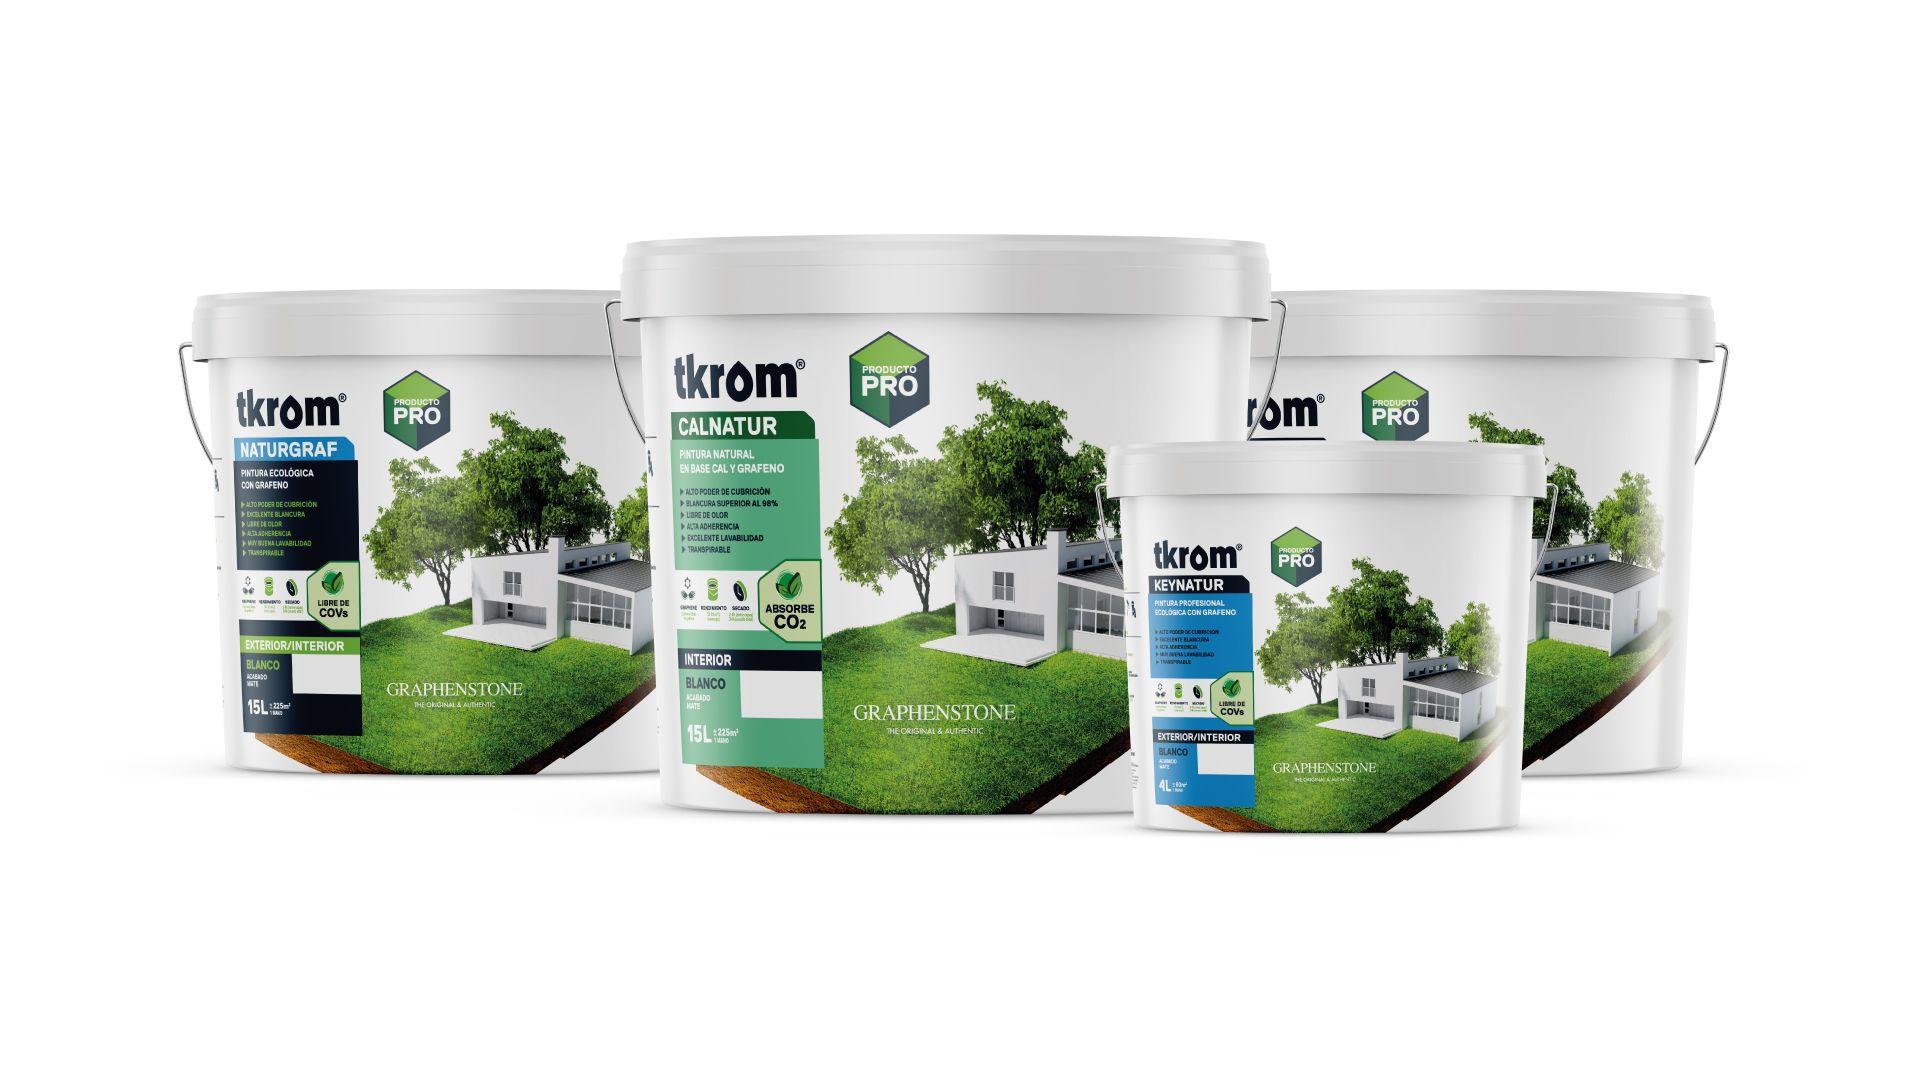 Fotografia tkrom graphenstone, la pintura que absorbe CO2